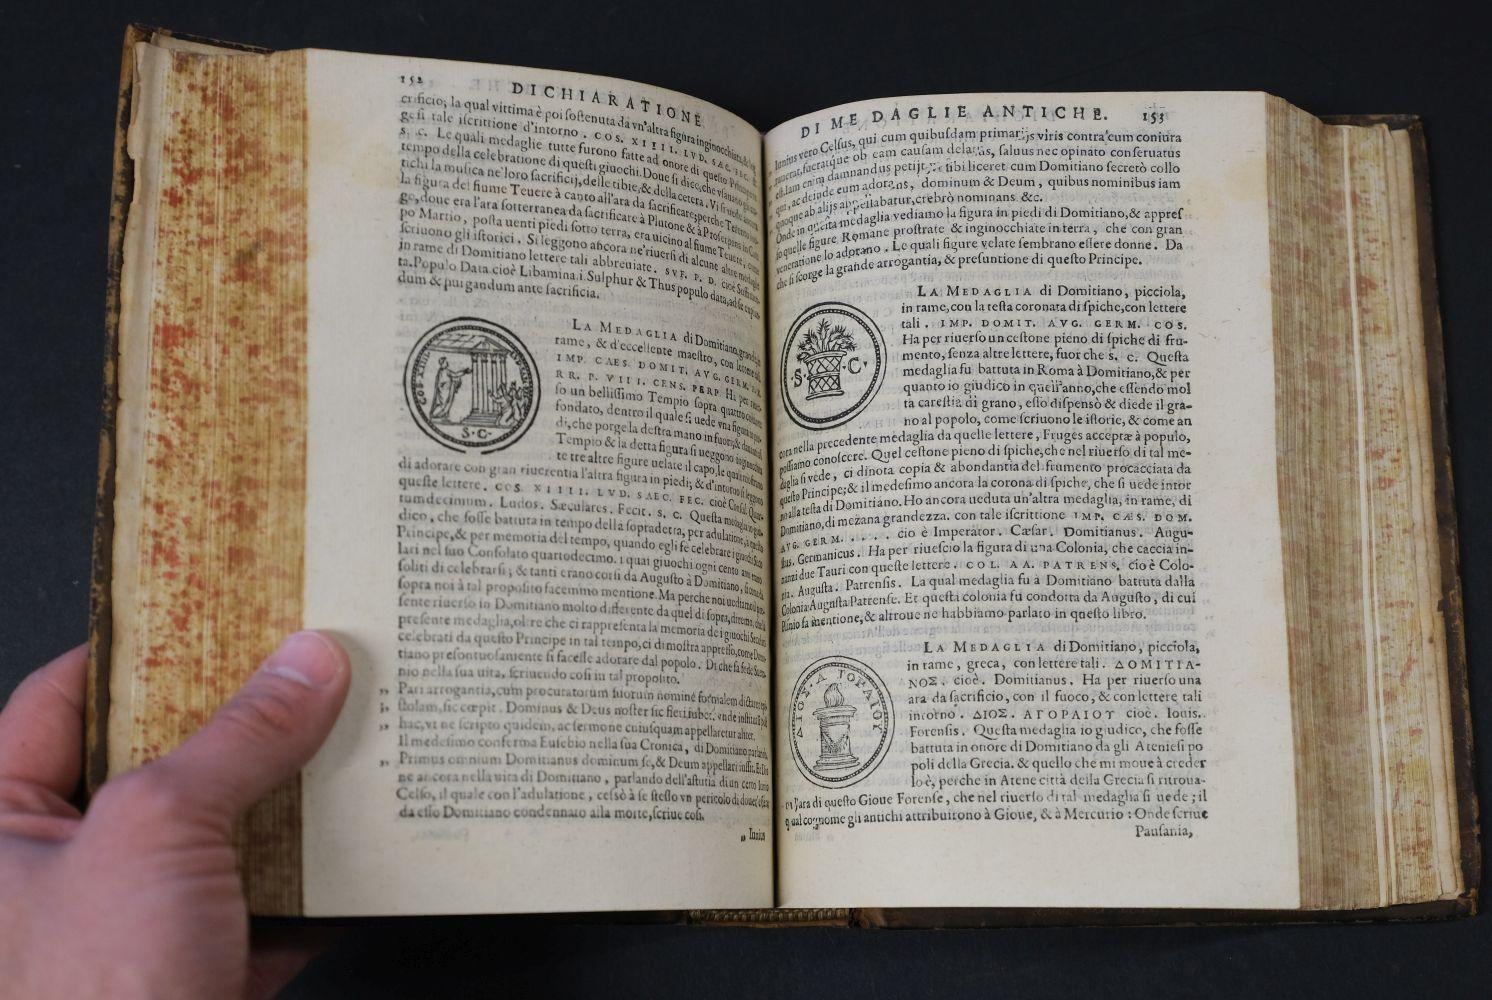 Erizzo (Sebastiano). Discorso sopra le medaglie, 4th edition, 1584, ex libris Fletcher of Saltoun - Image 10 of 11